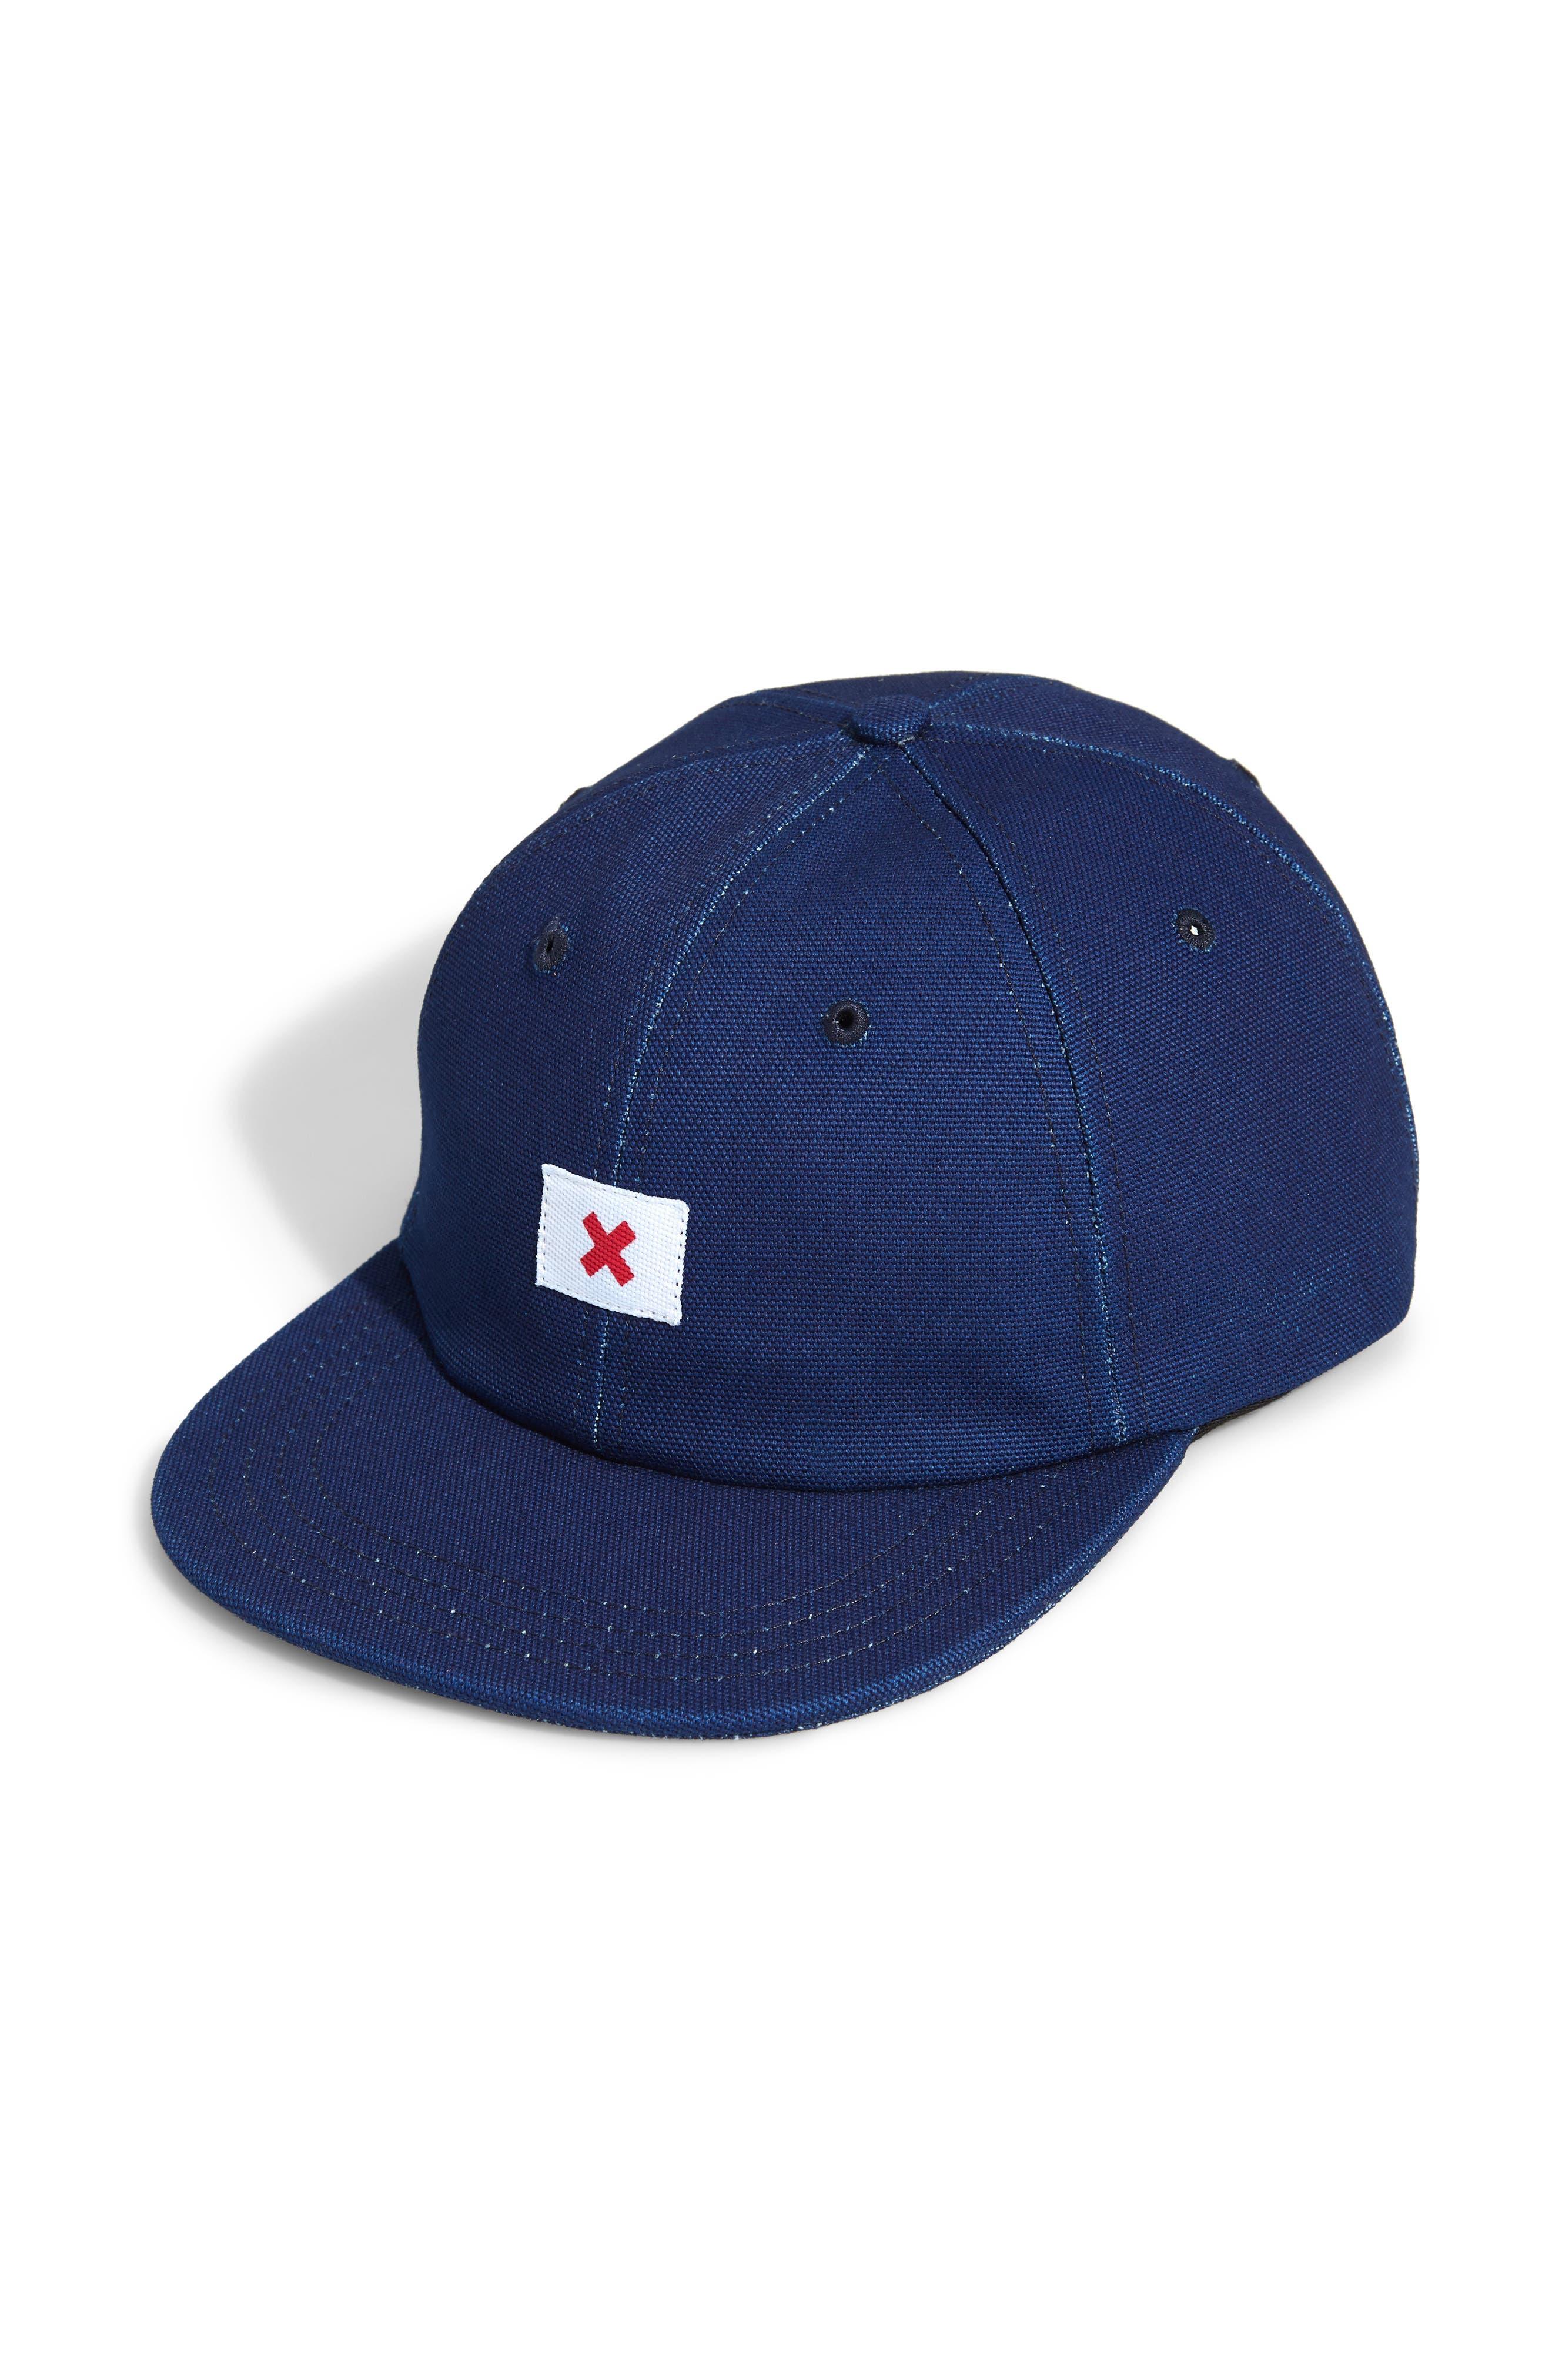 Kojima Canvas Baseball Cap,                         Main,                         color, INDIGO